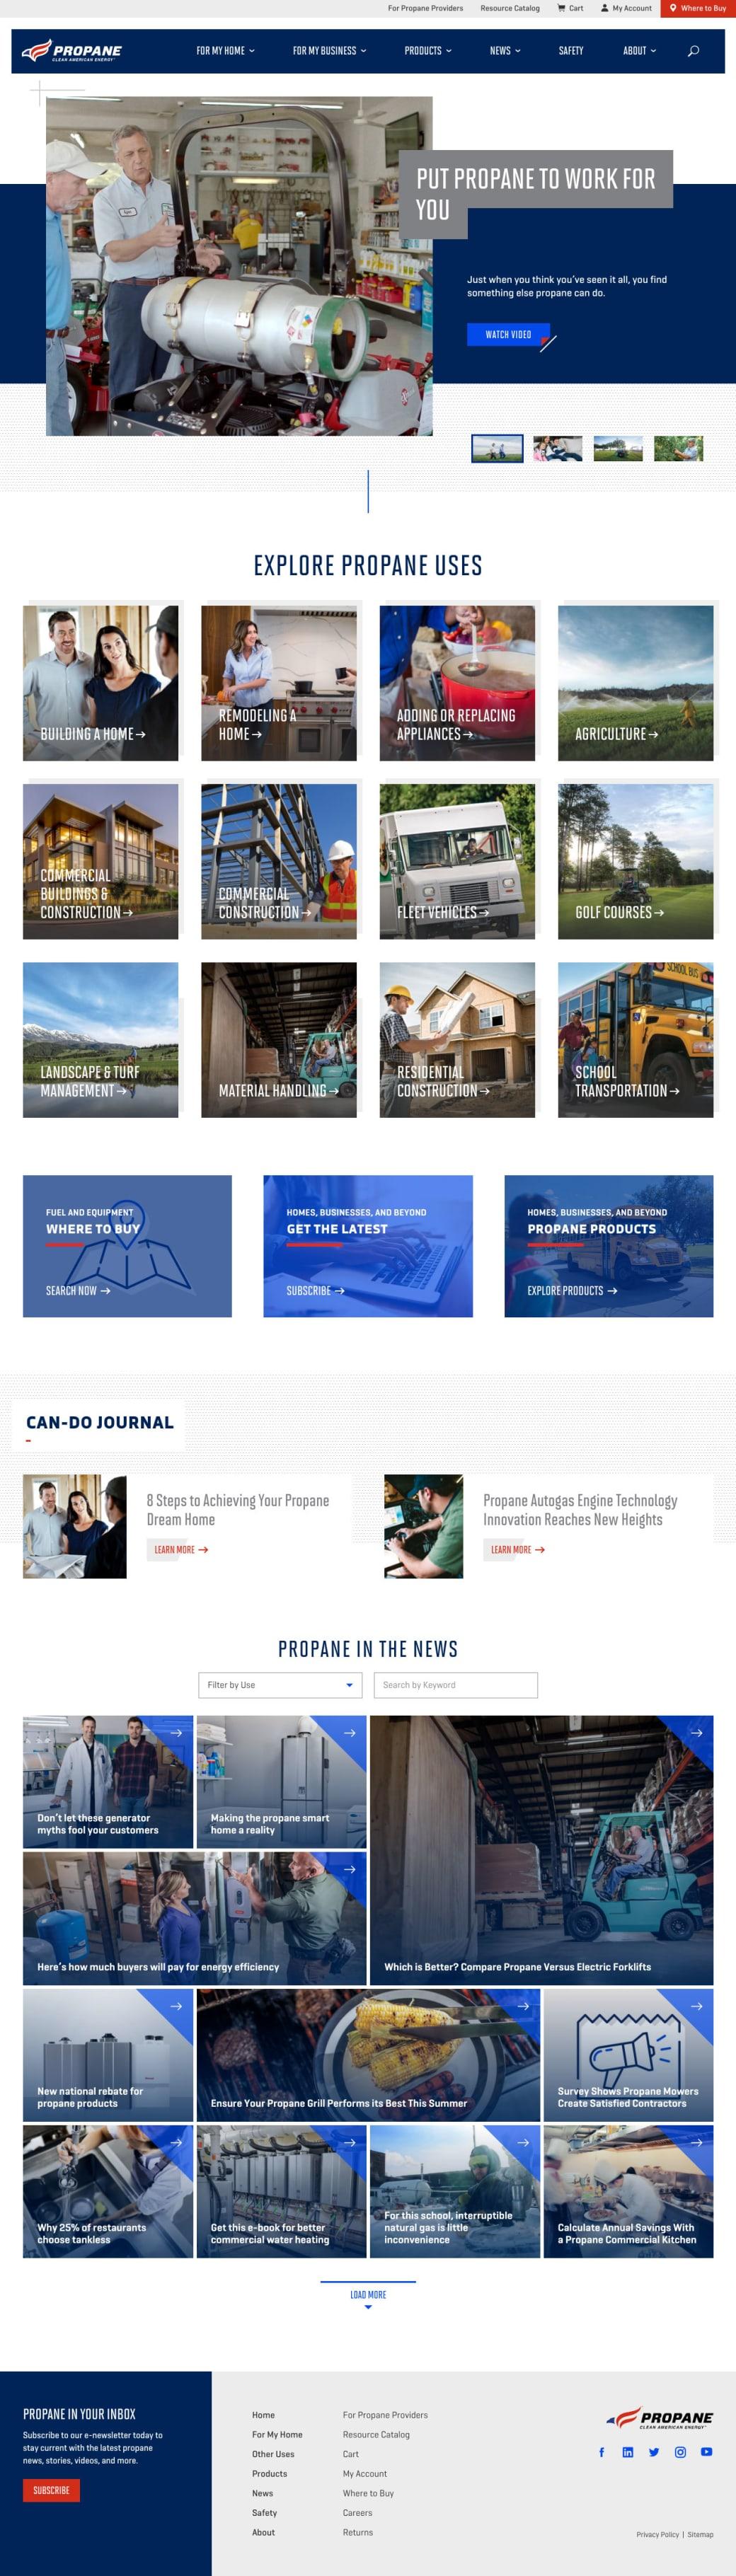 propane-perc-homepage.jpg